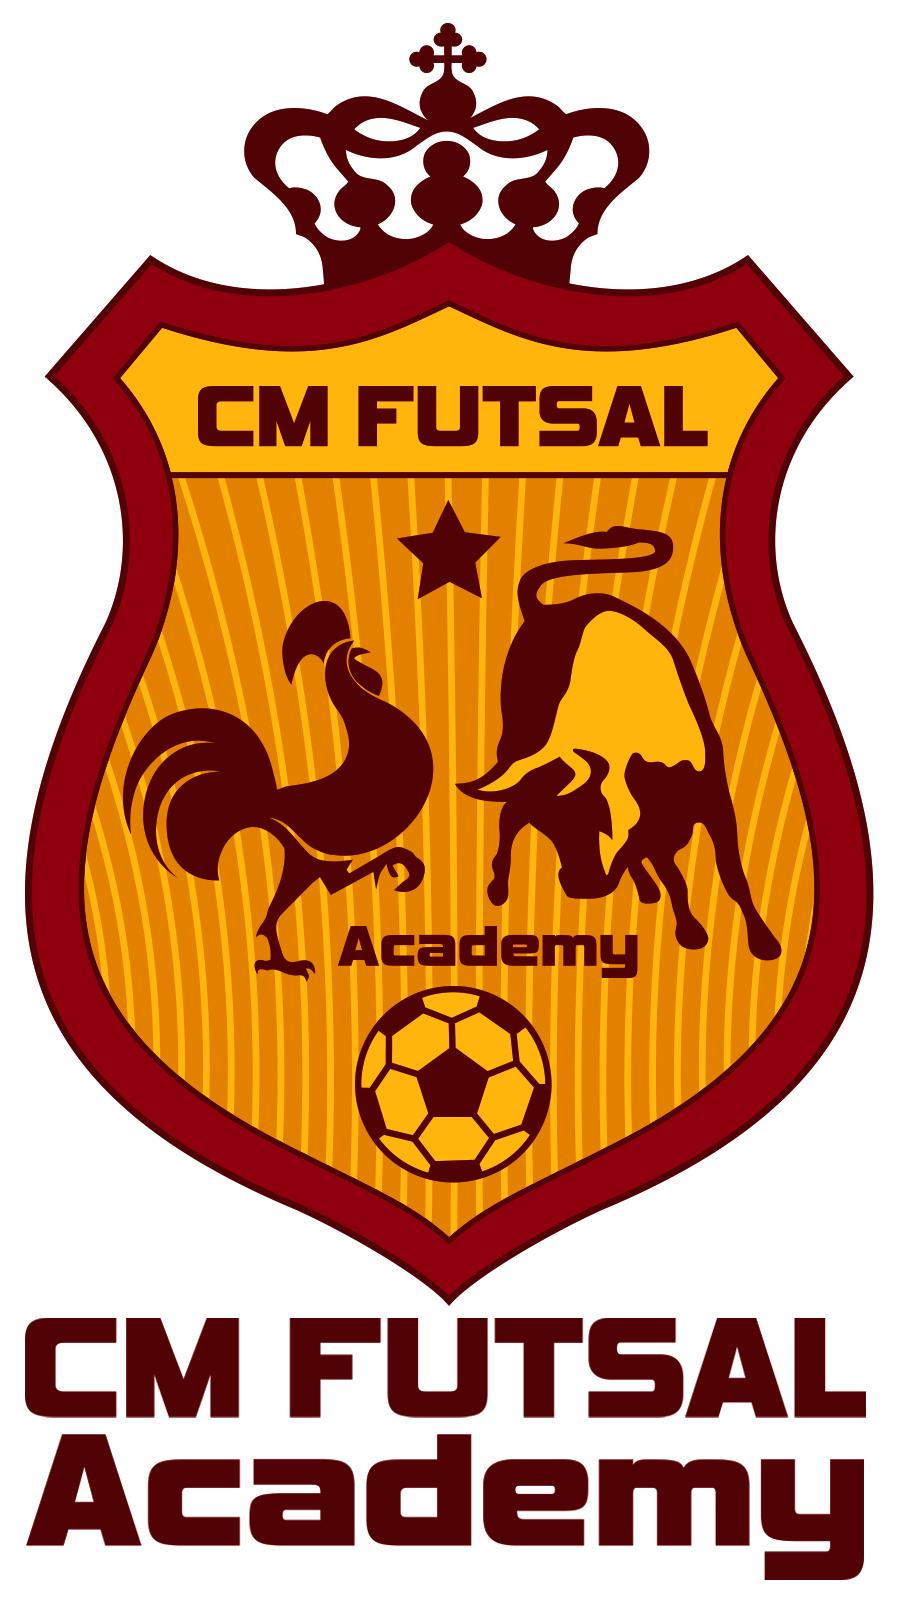 CM Futsal Academy